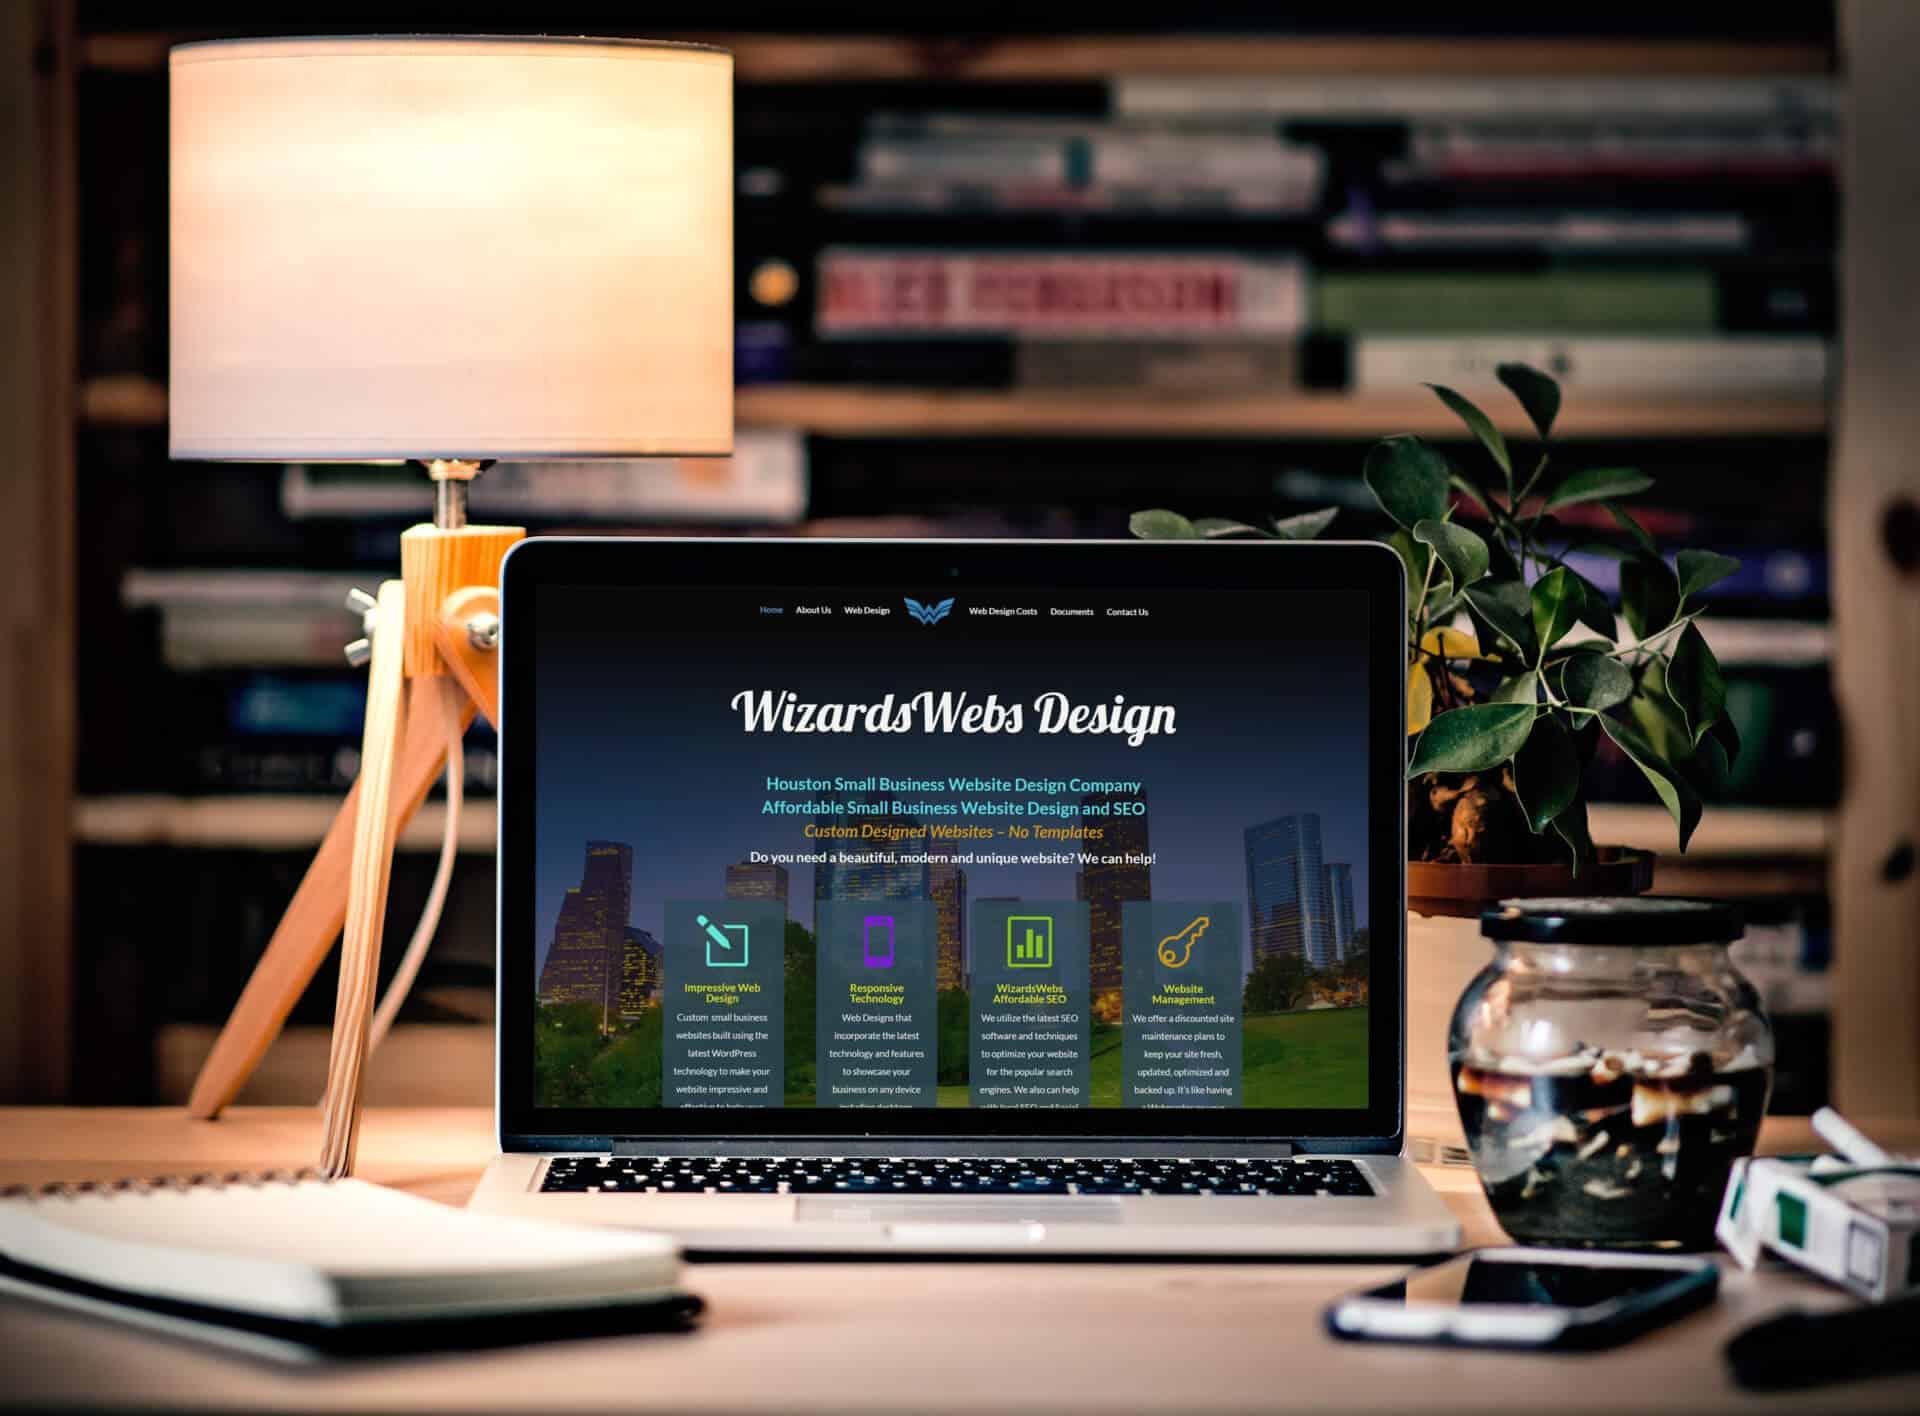 Webdesign Services in Houston, Texas - WizardsWebs Design LLC